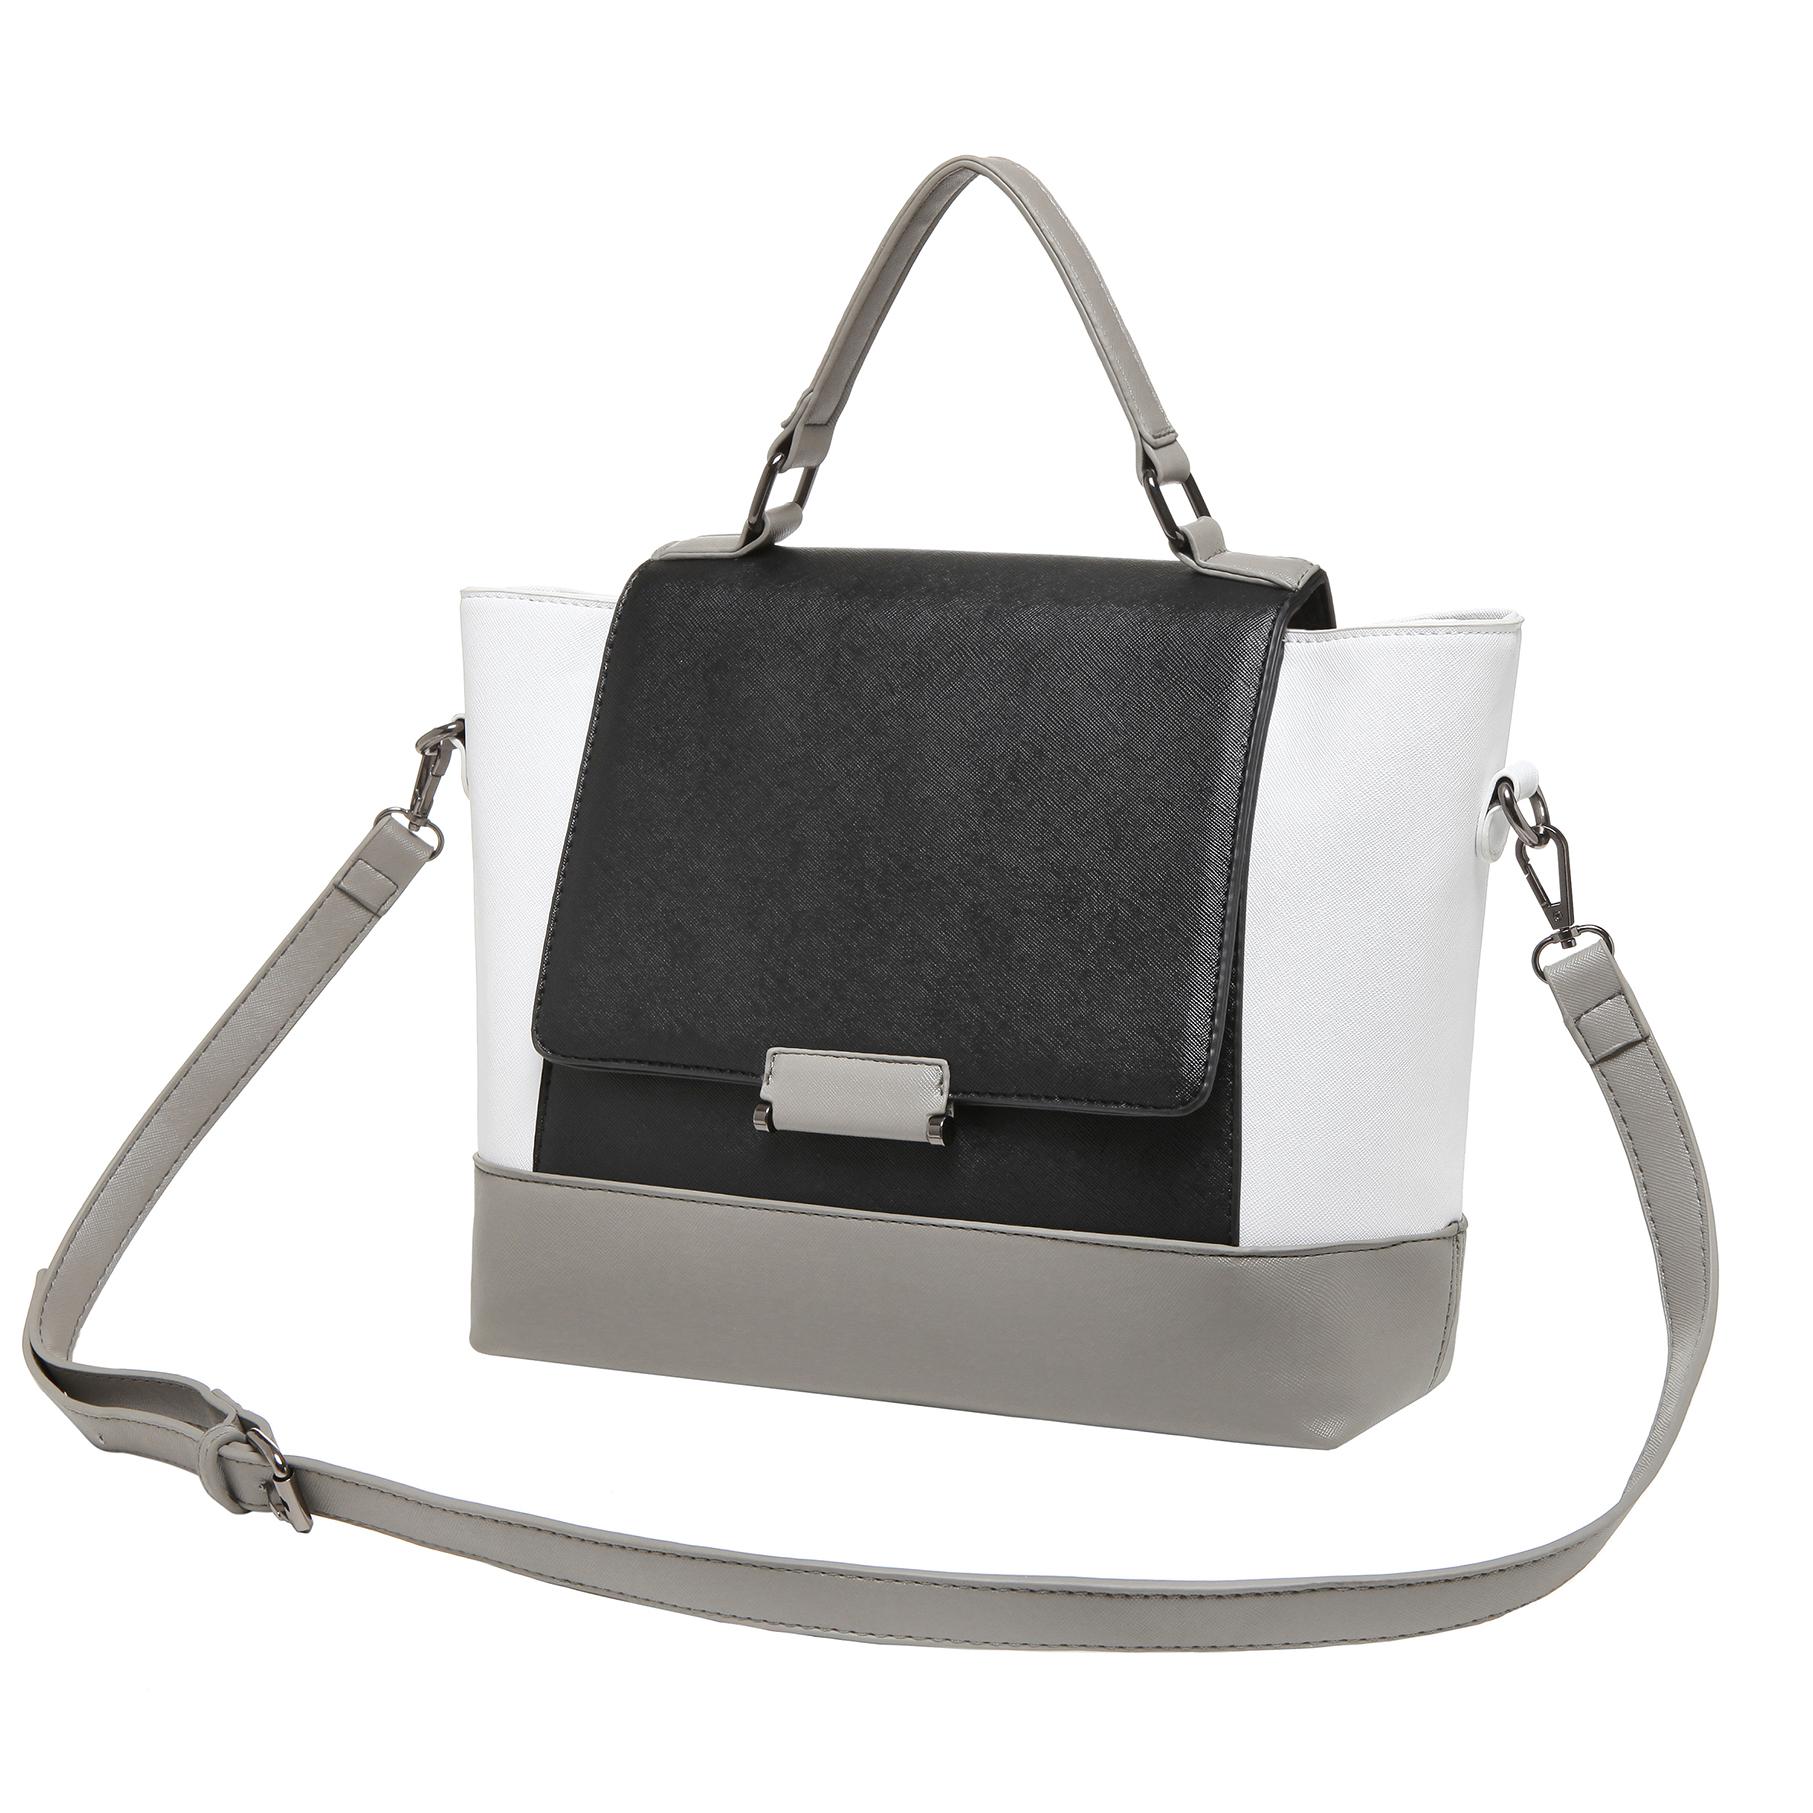 mg-collection-meryl-top-handle-tote-handbag-tb-h0651blk-3.jpg